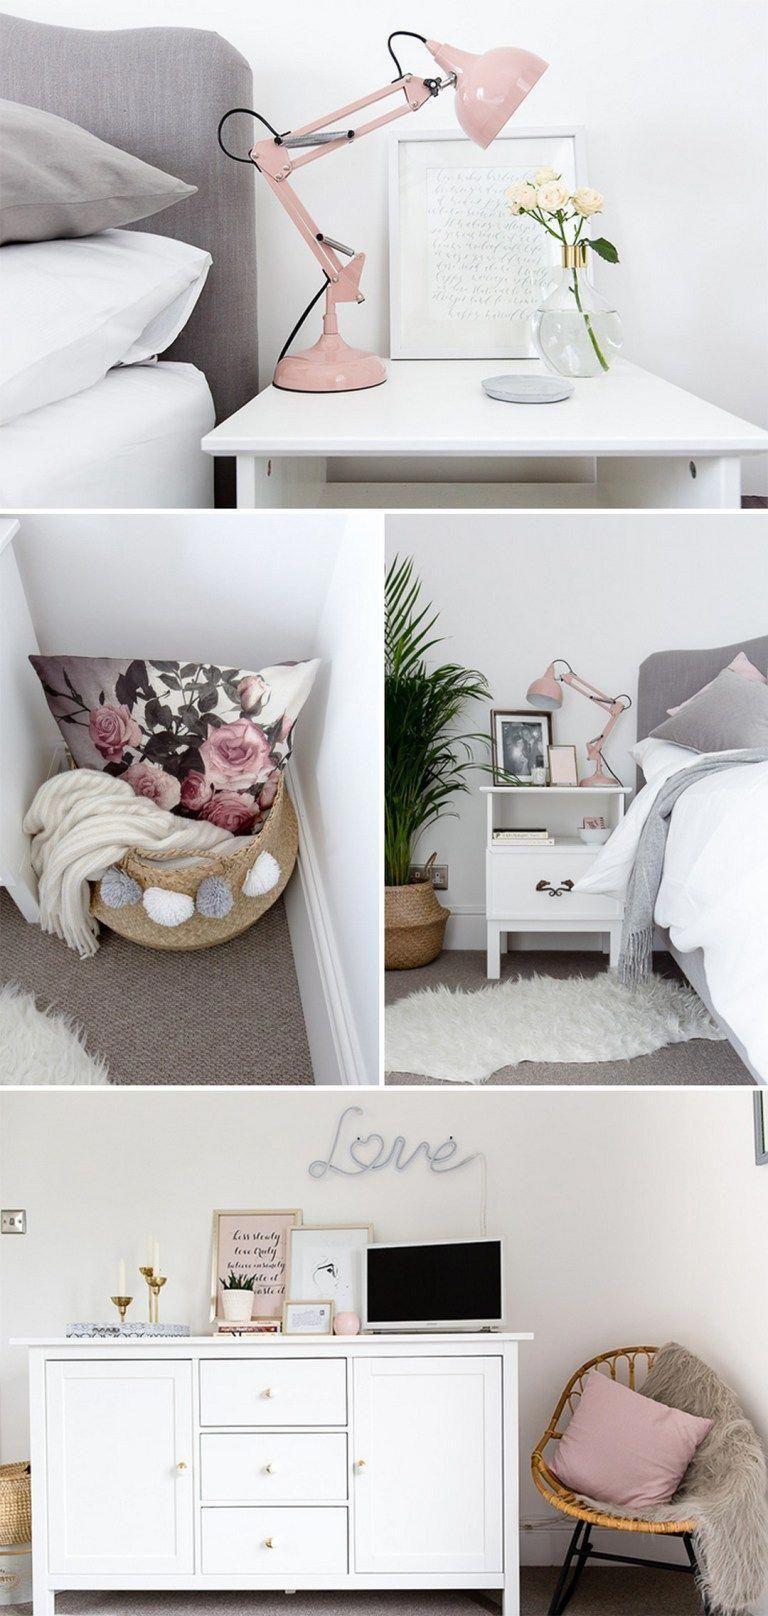 Cute bedroom design idea interior coolbedroomdecor also rh pinterest